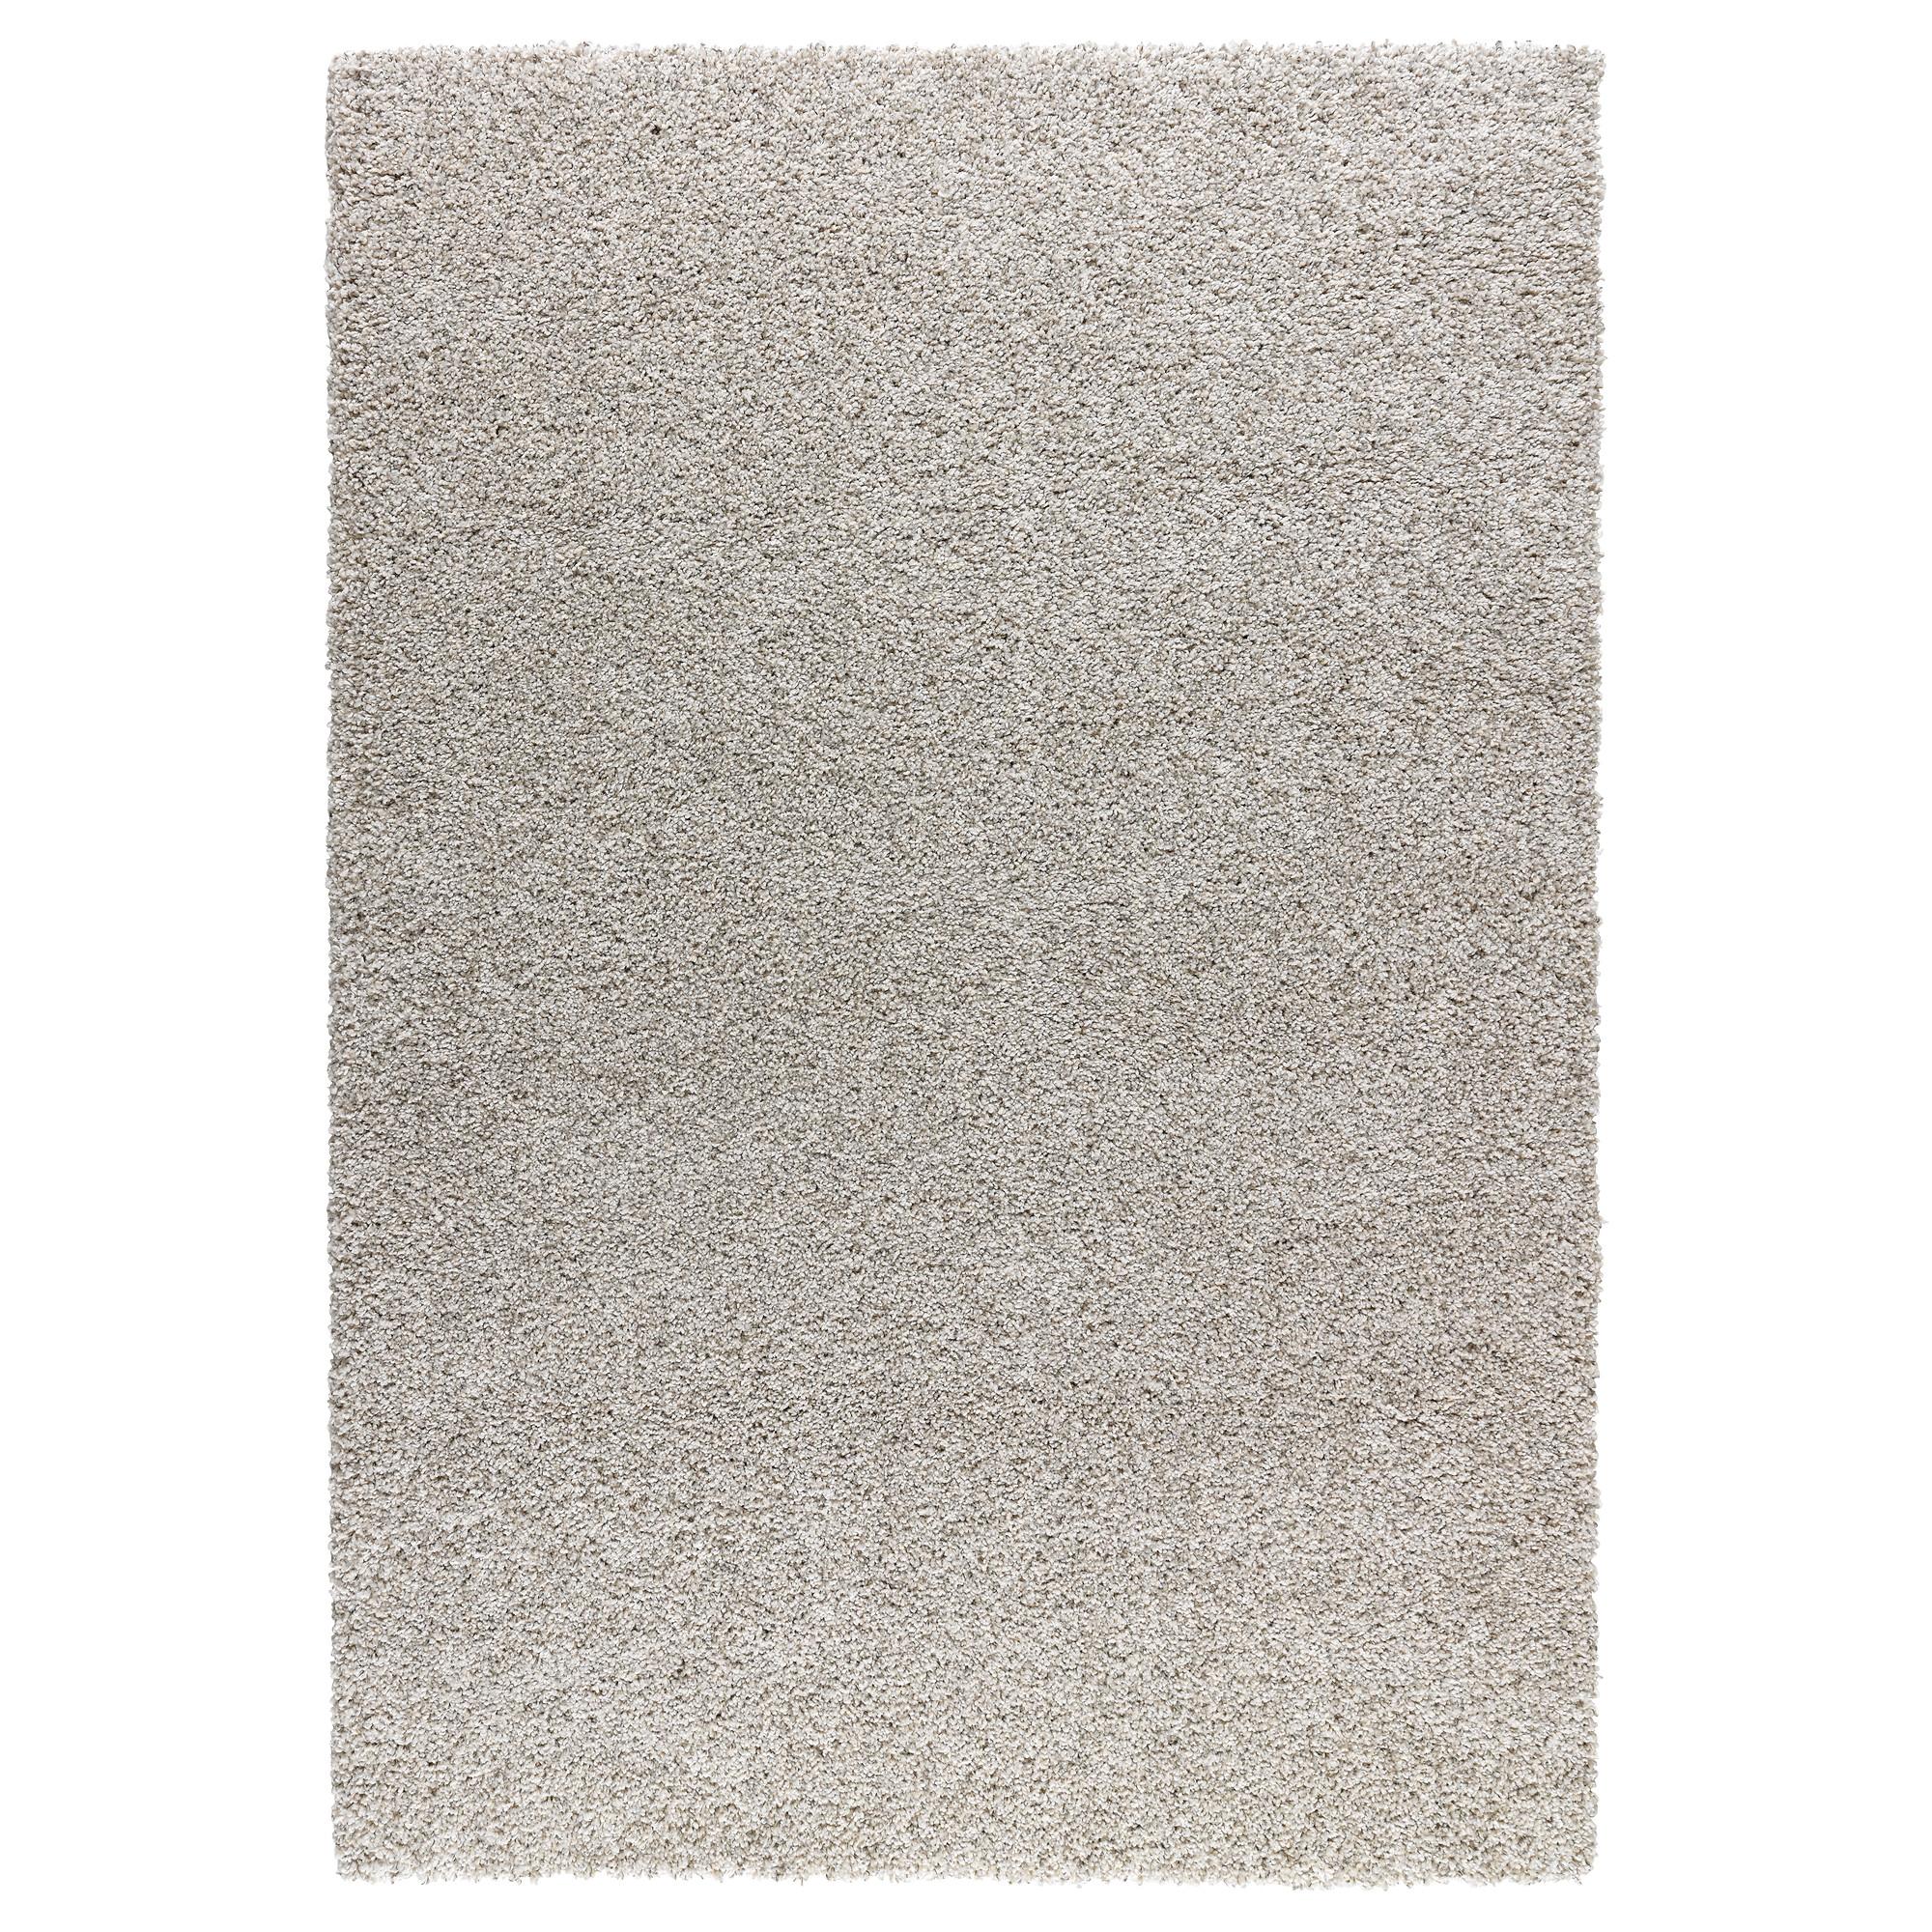 Alhede alfombra pelo largo 160x240 hueso - Antideslizante alfombras ikea ...